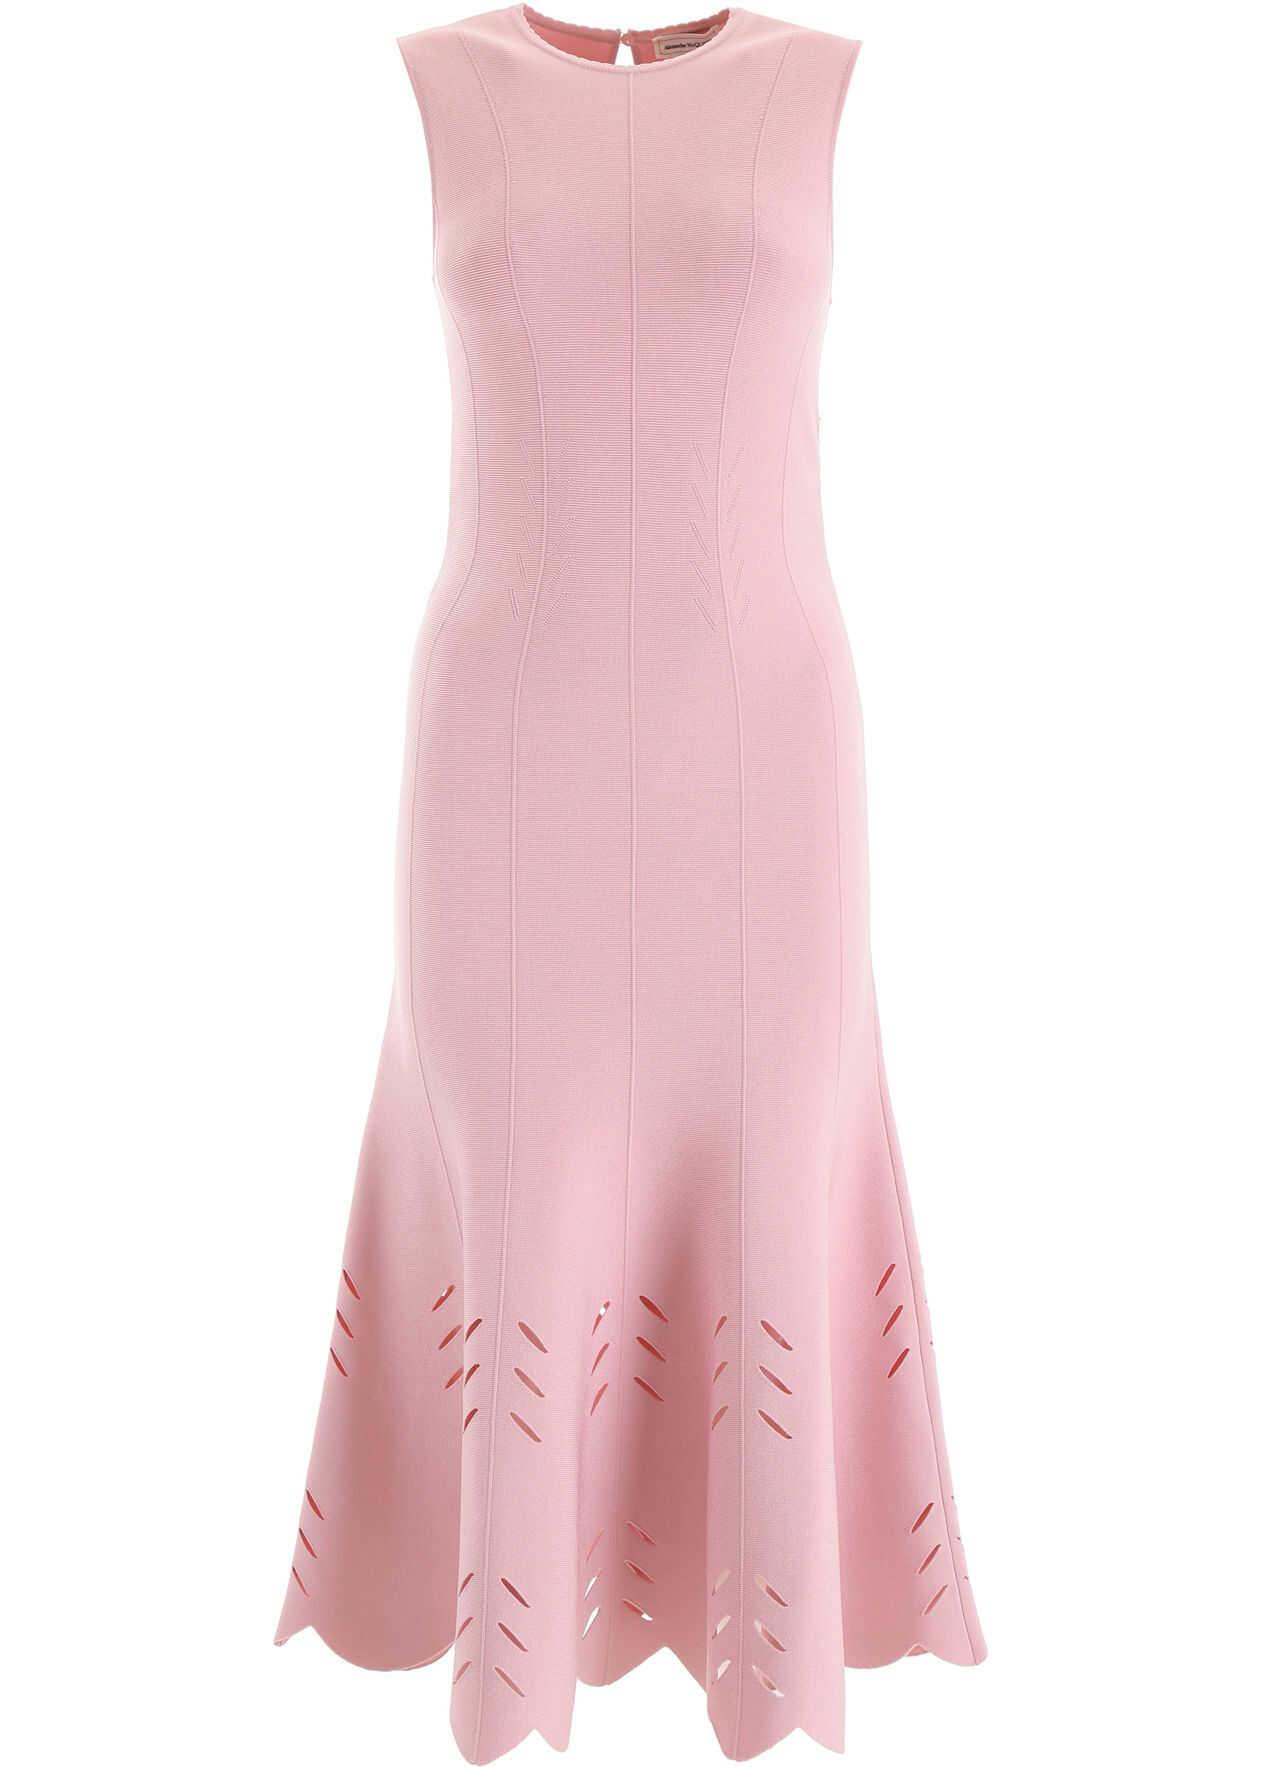 Alexander McQueen Knit Midi Dress BLUSH PINK